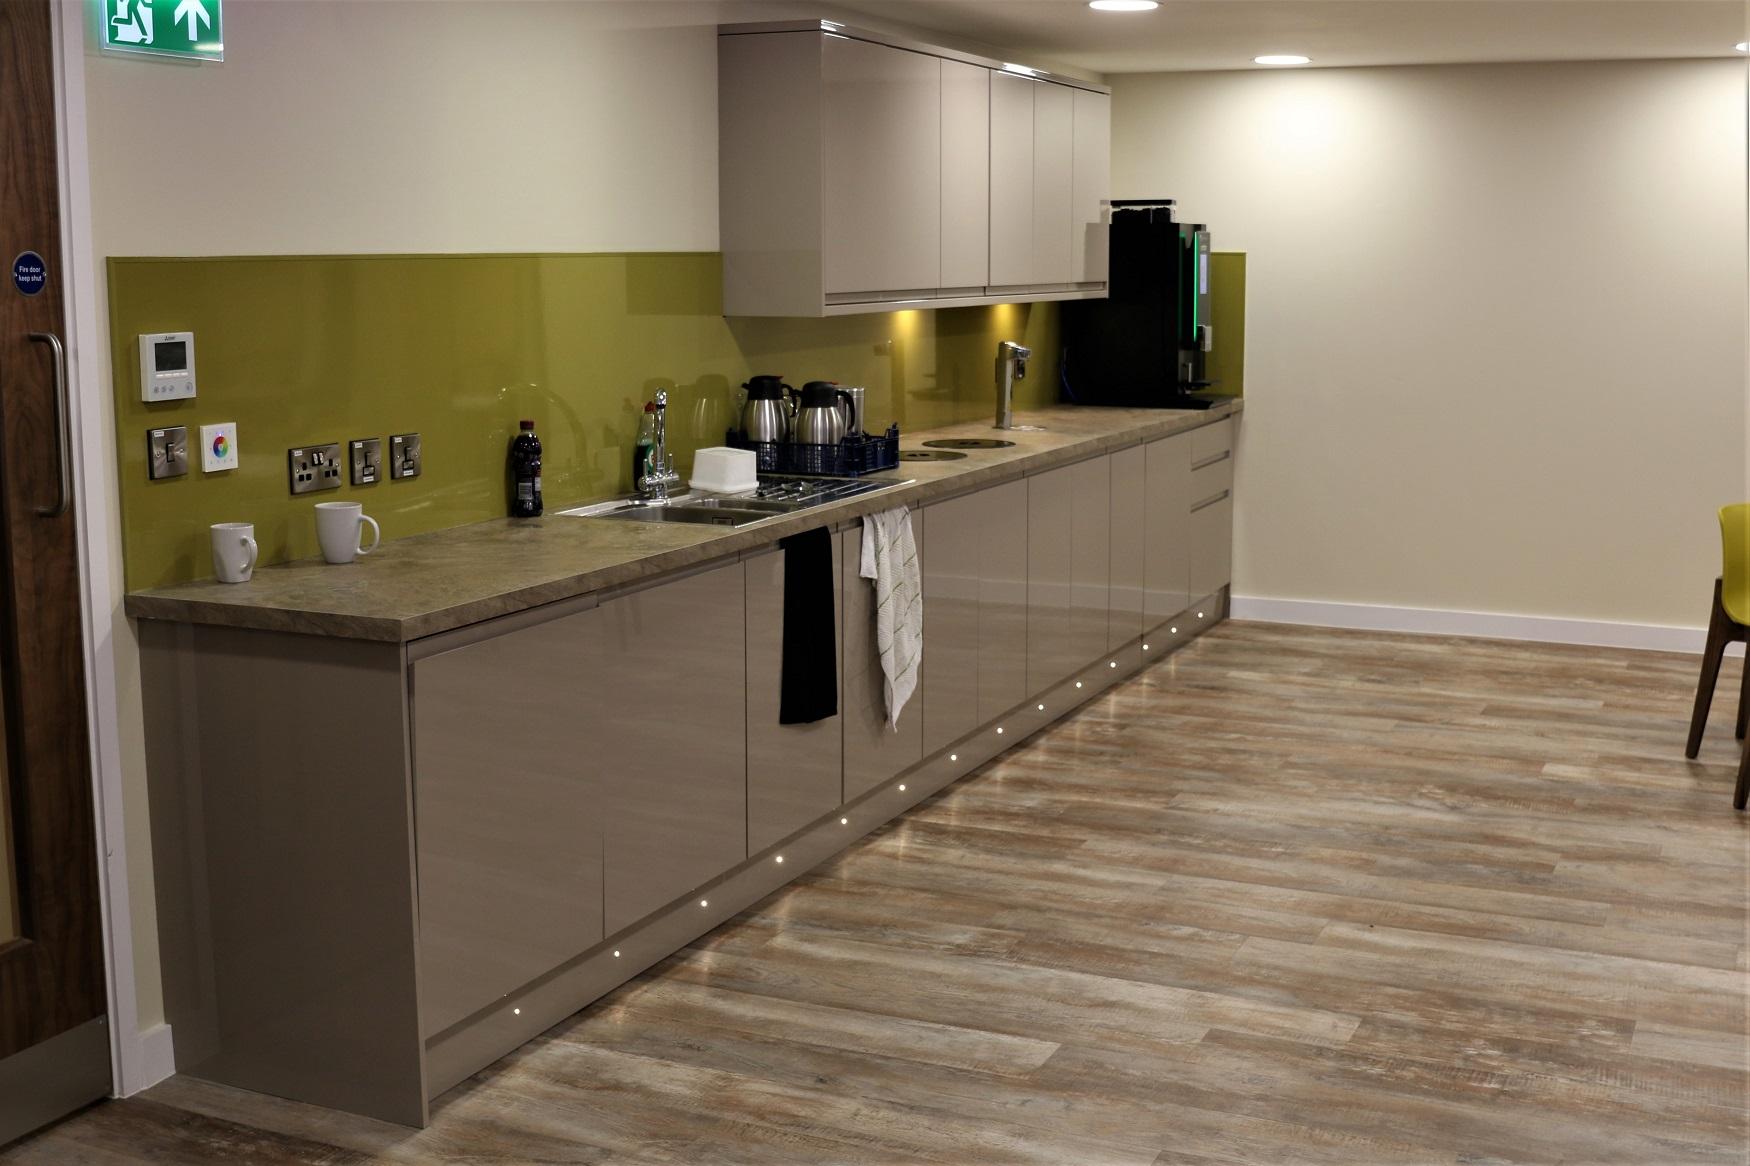 Large, modern, glossy kitchen area